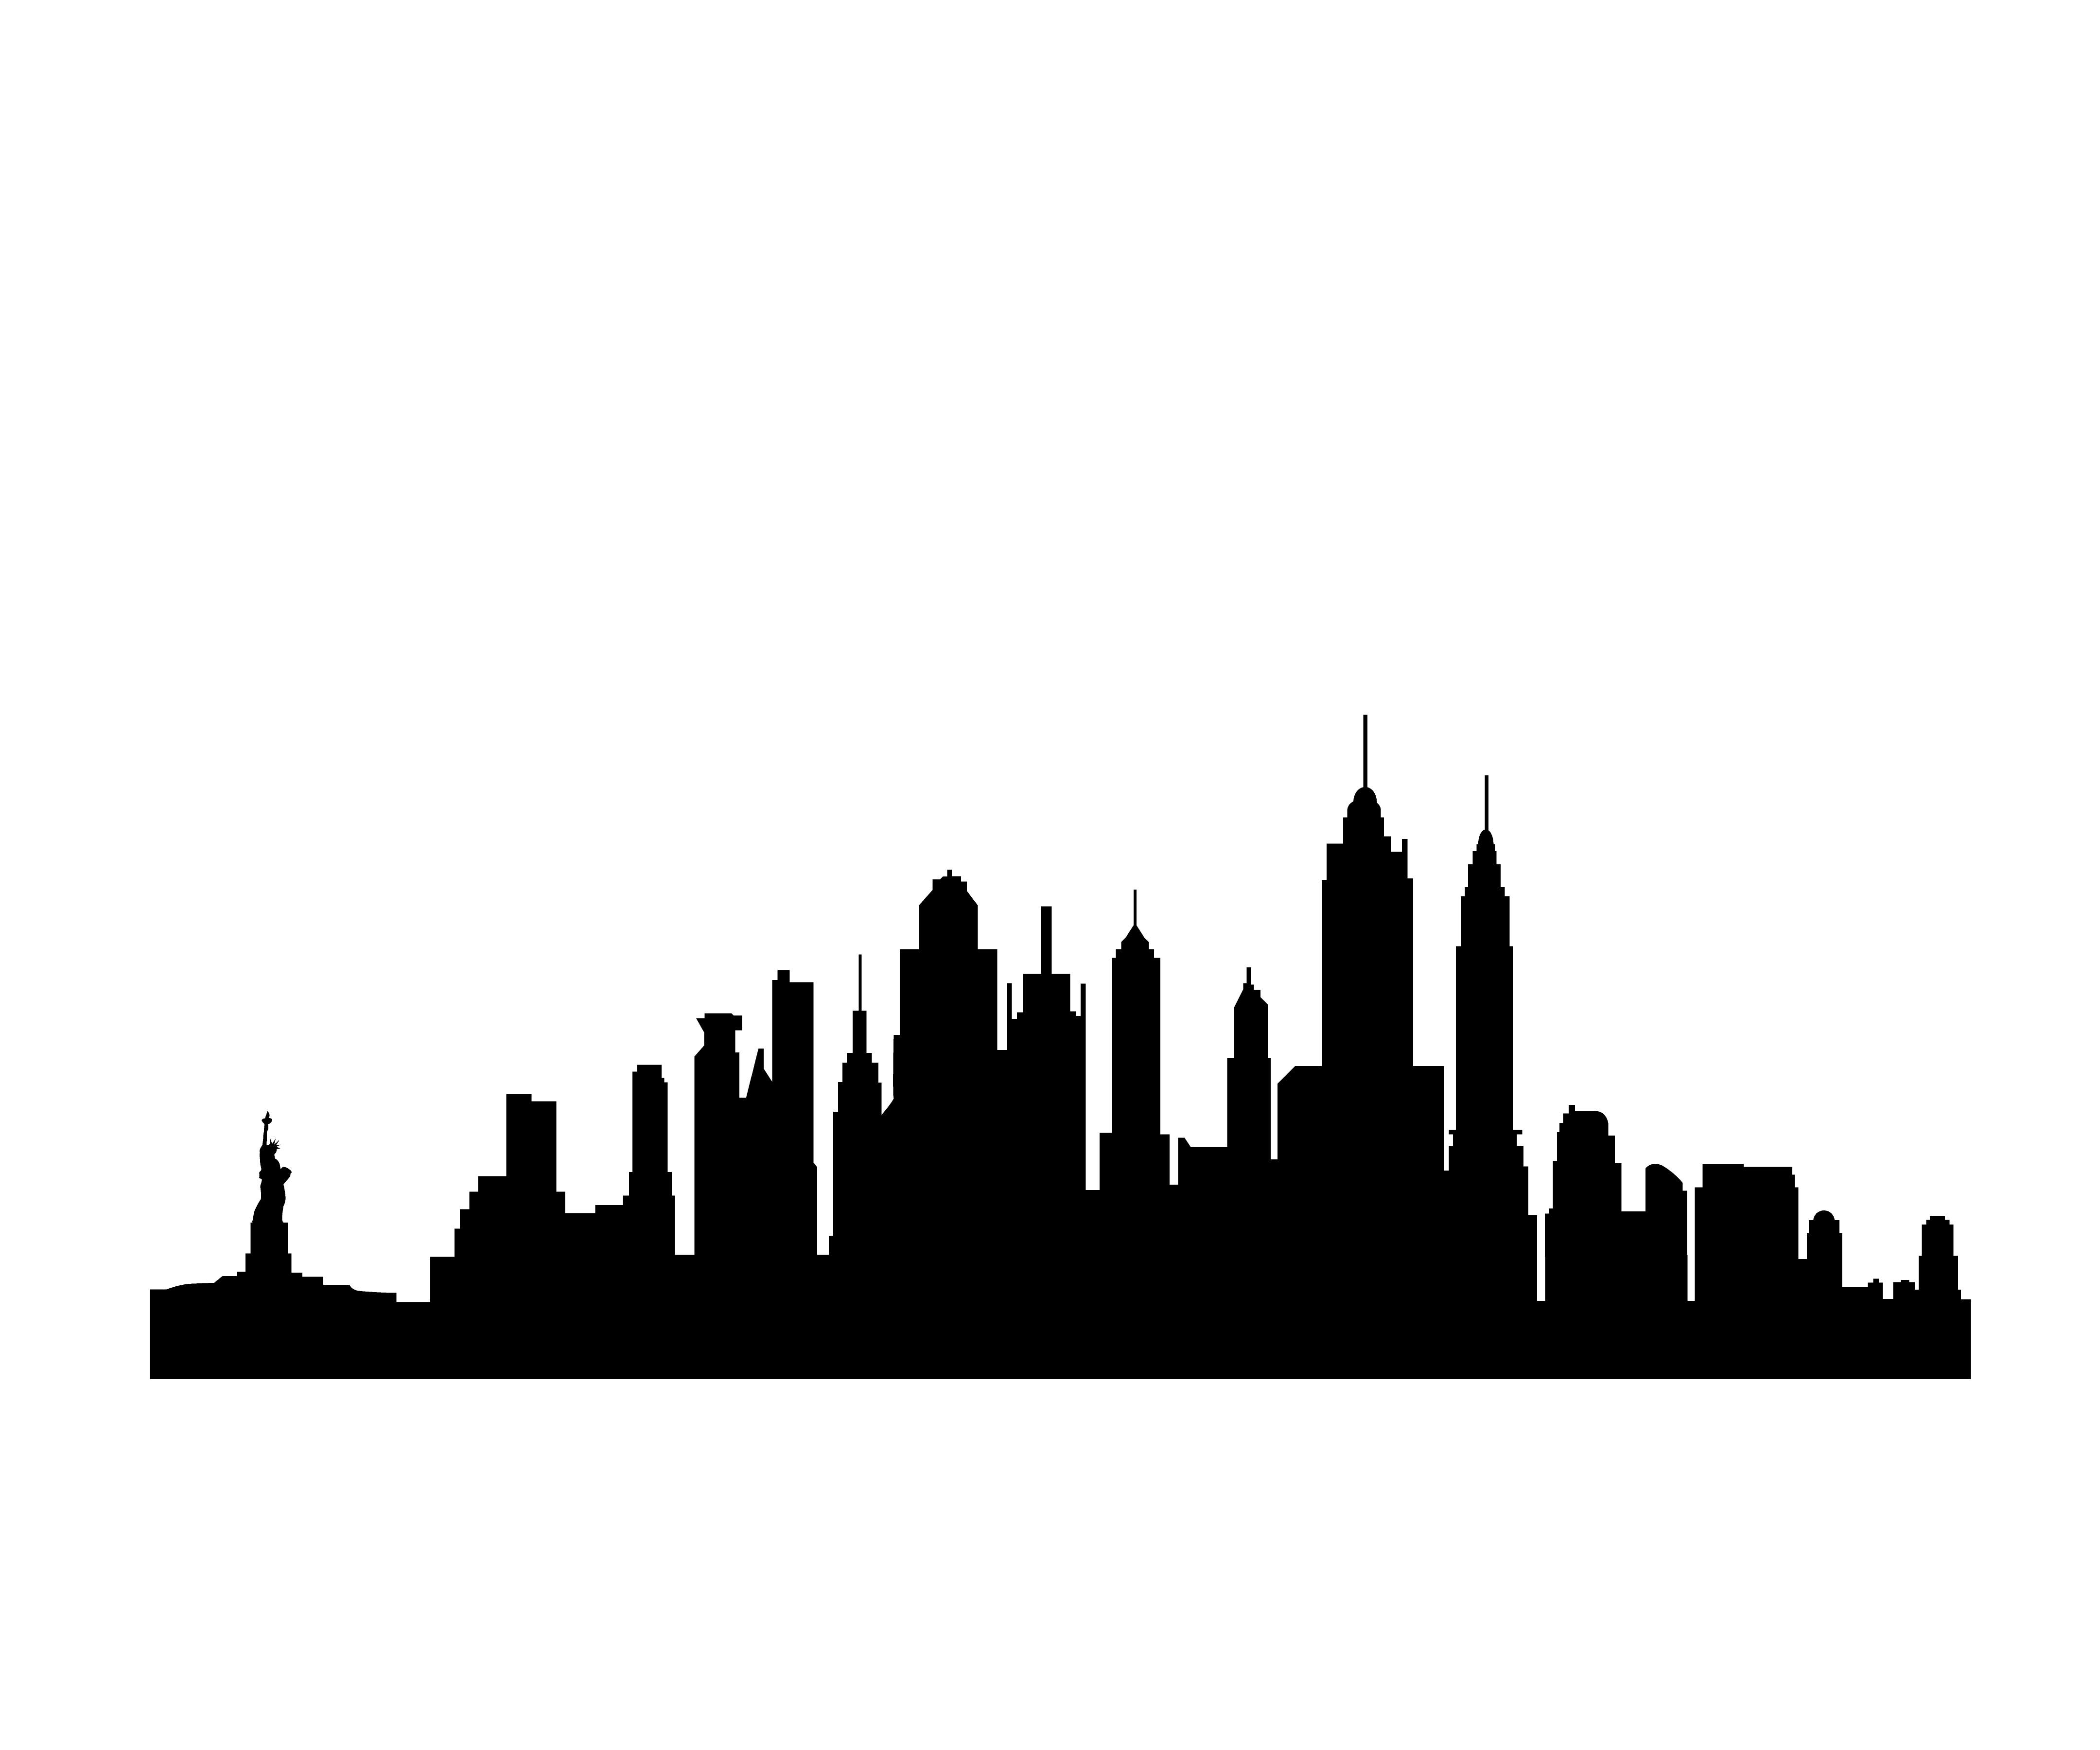 4320x3600 New York Skyline Black And White Silhouette